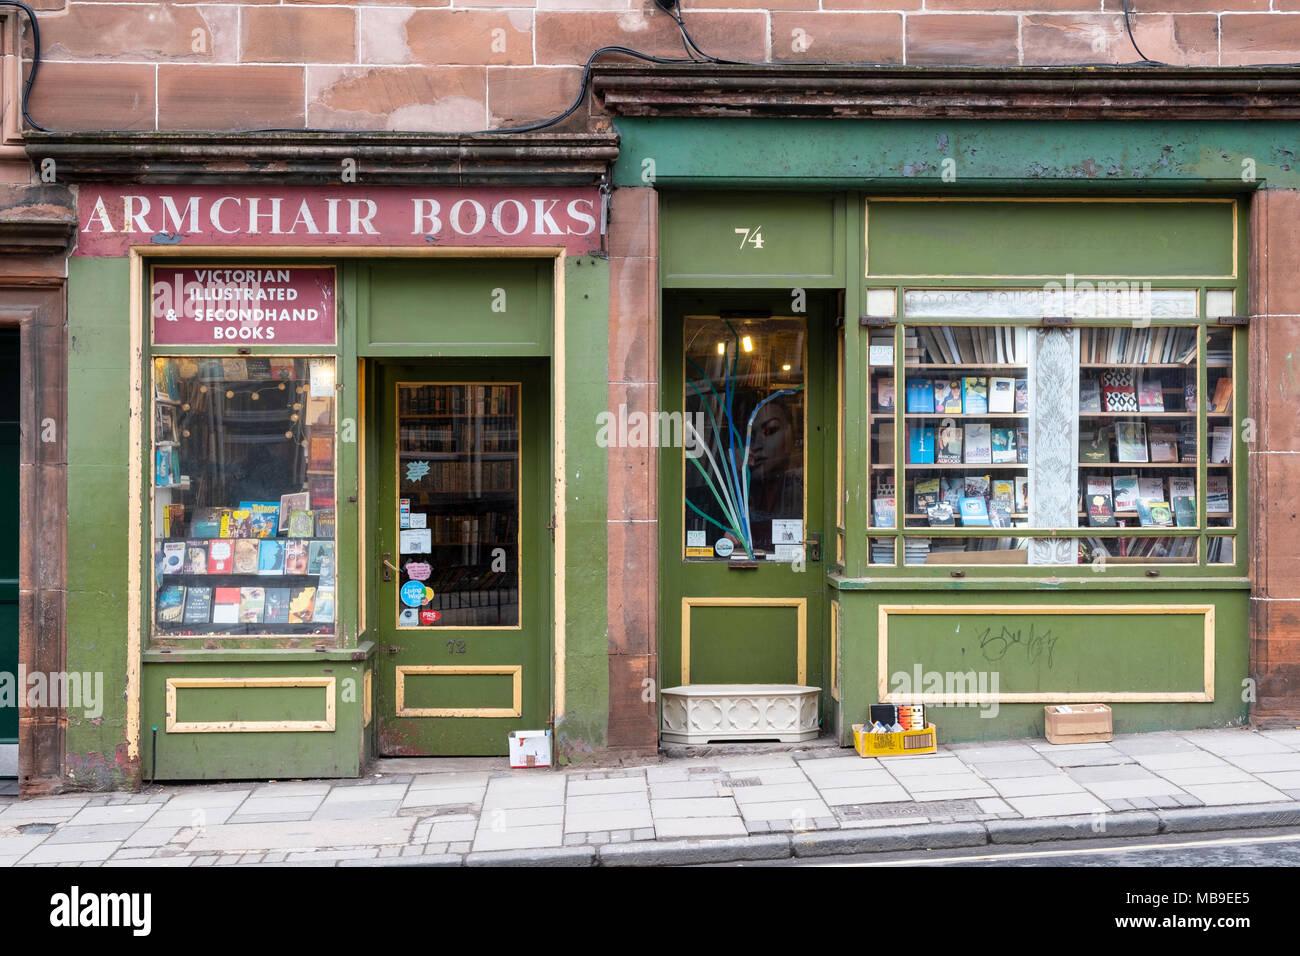 Armchair Books Edinburgh Uk Inspired By U Ktdid95 3264 2448oc